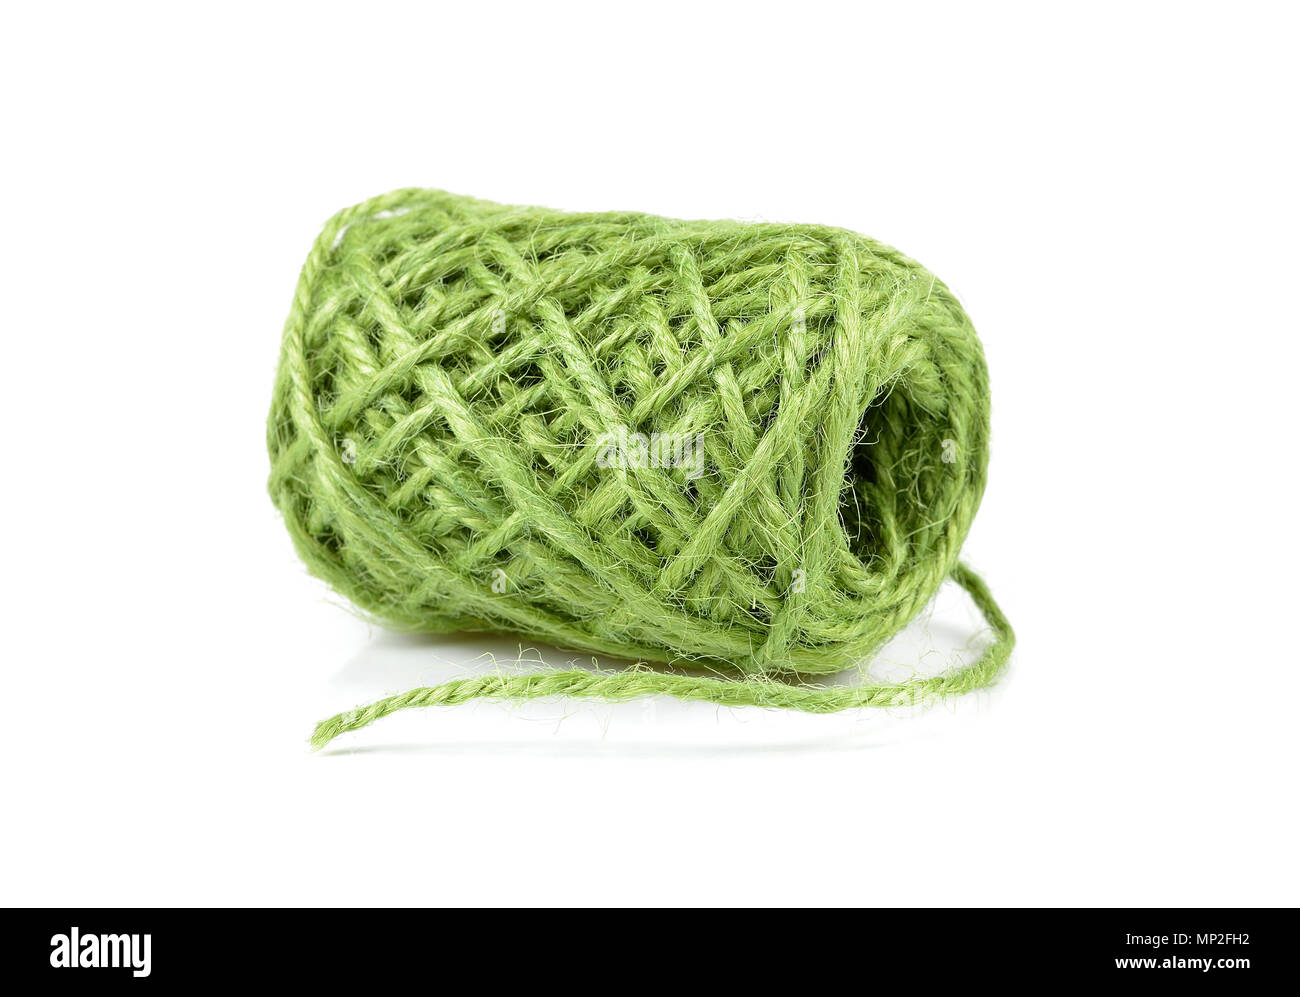 Green Sisal Yarn Stock Photos & Green Sisal Yarn Stock